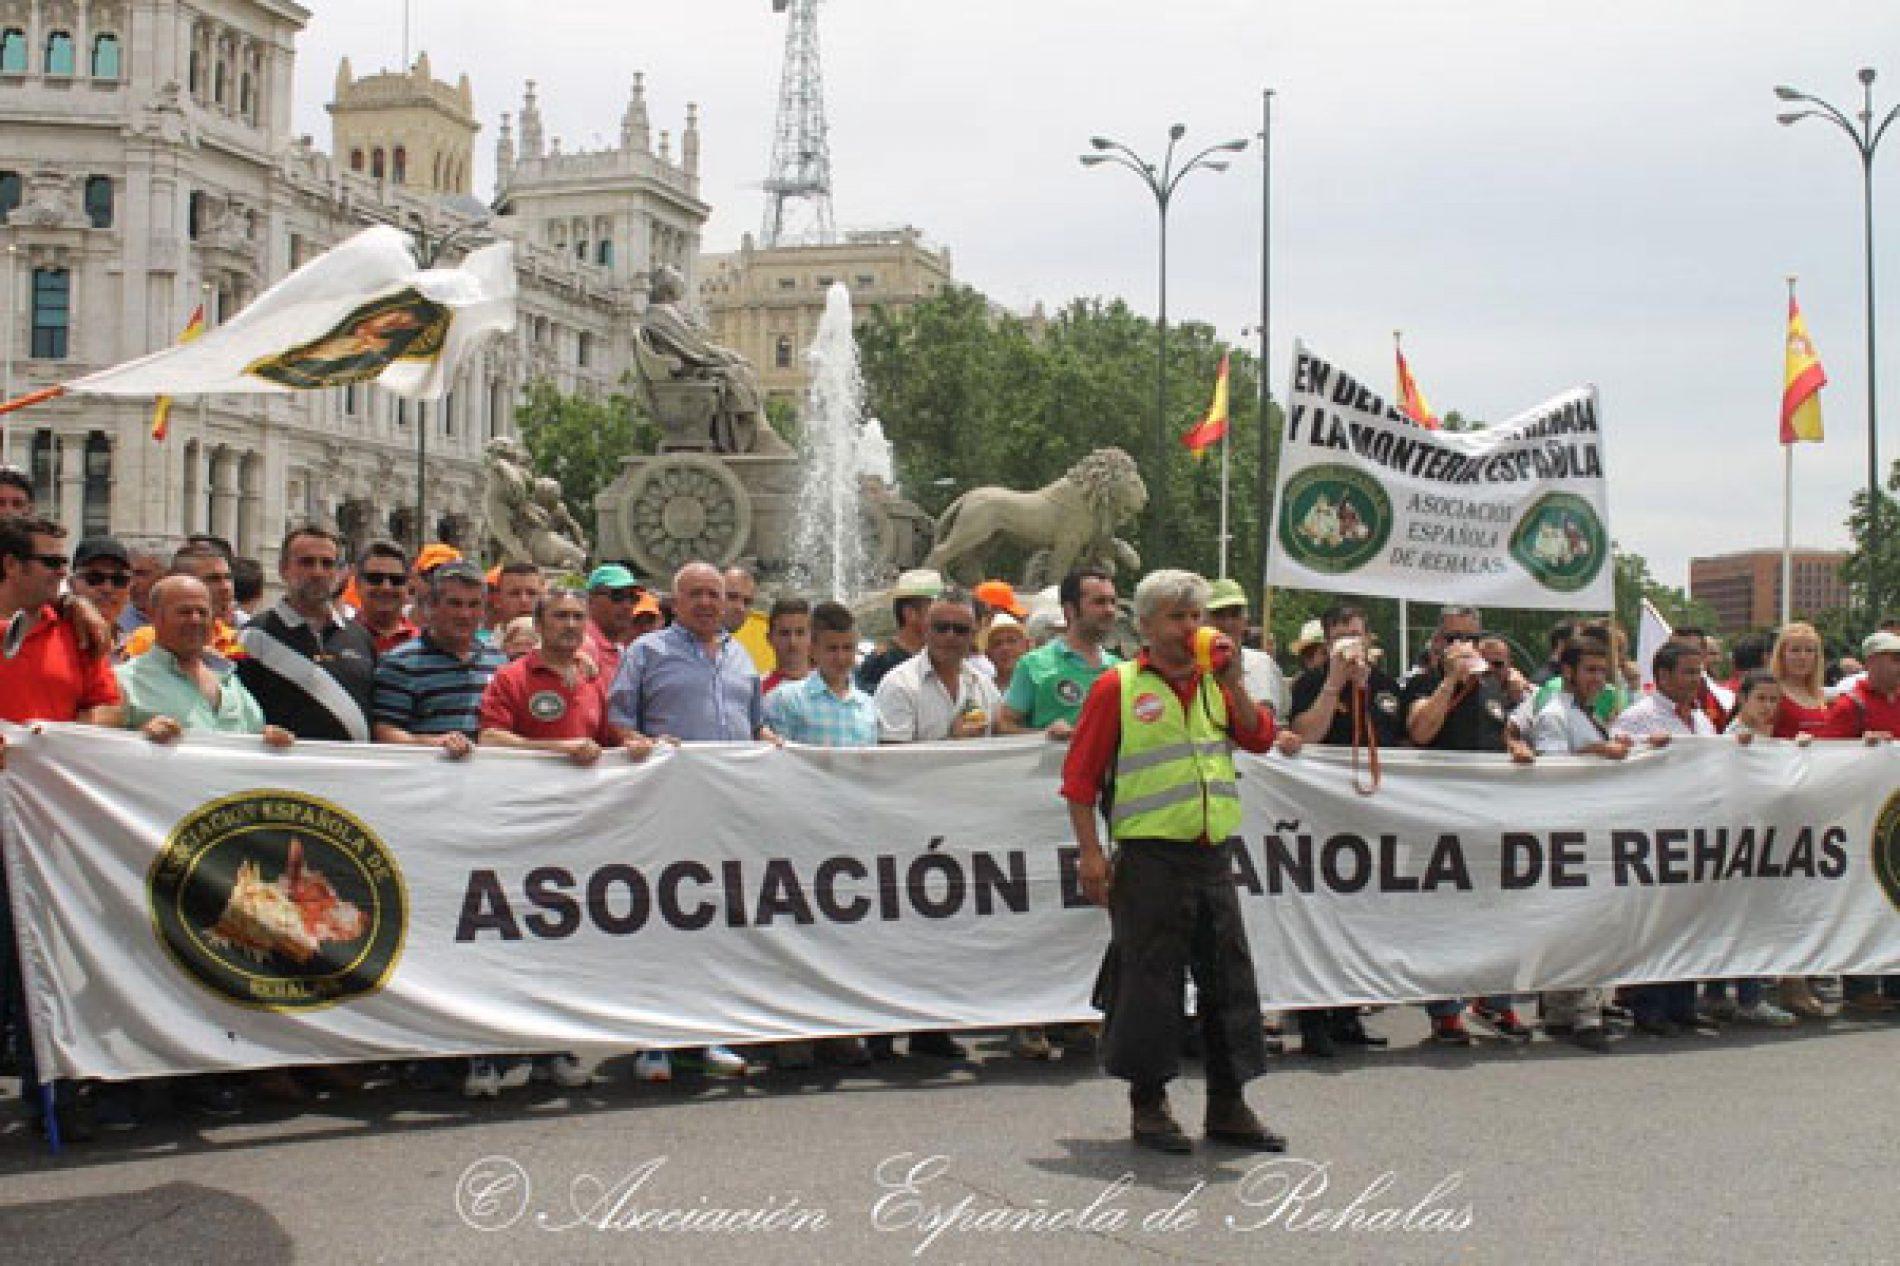 Manifestación 5-J en Madrid. ¡¡¡ Espectacular¡!!